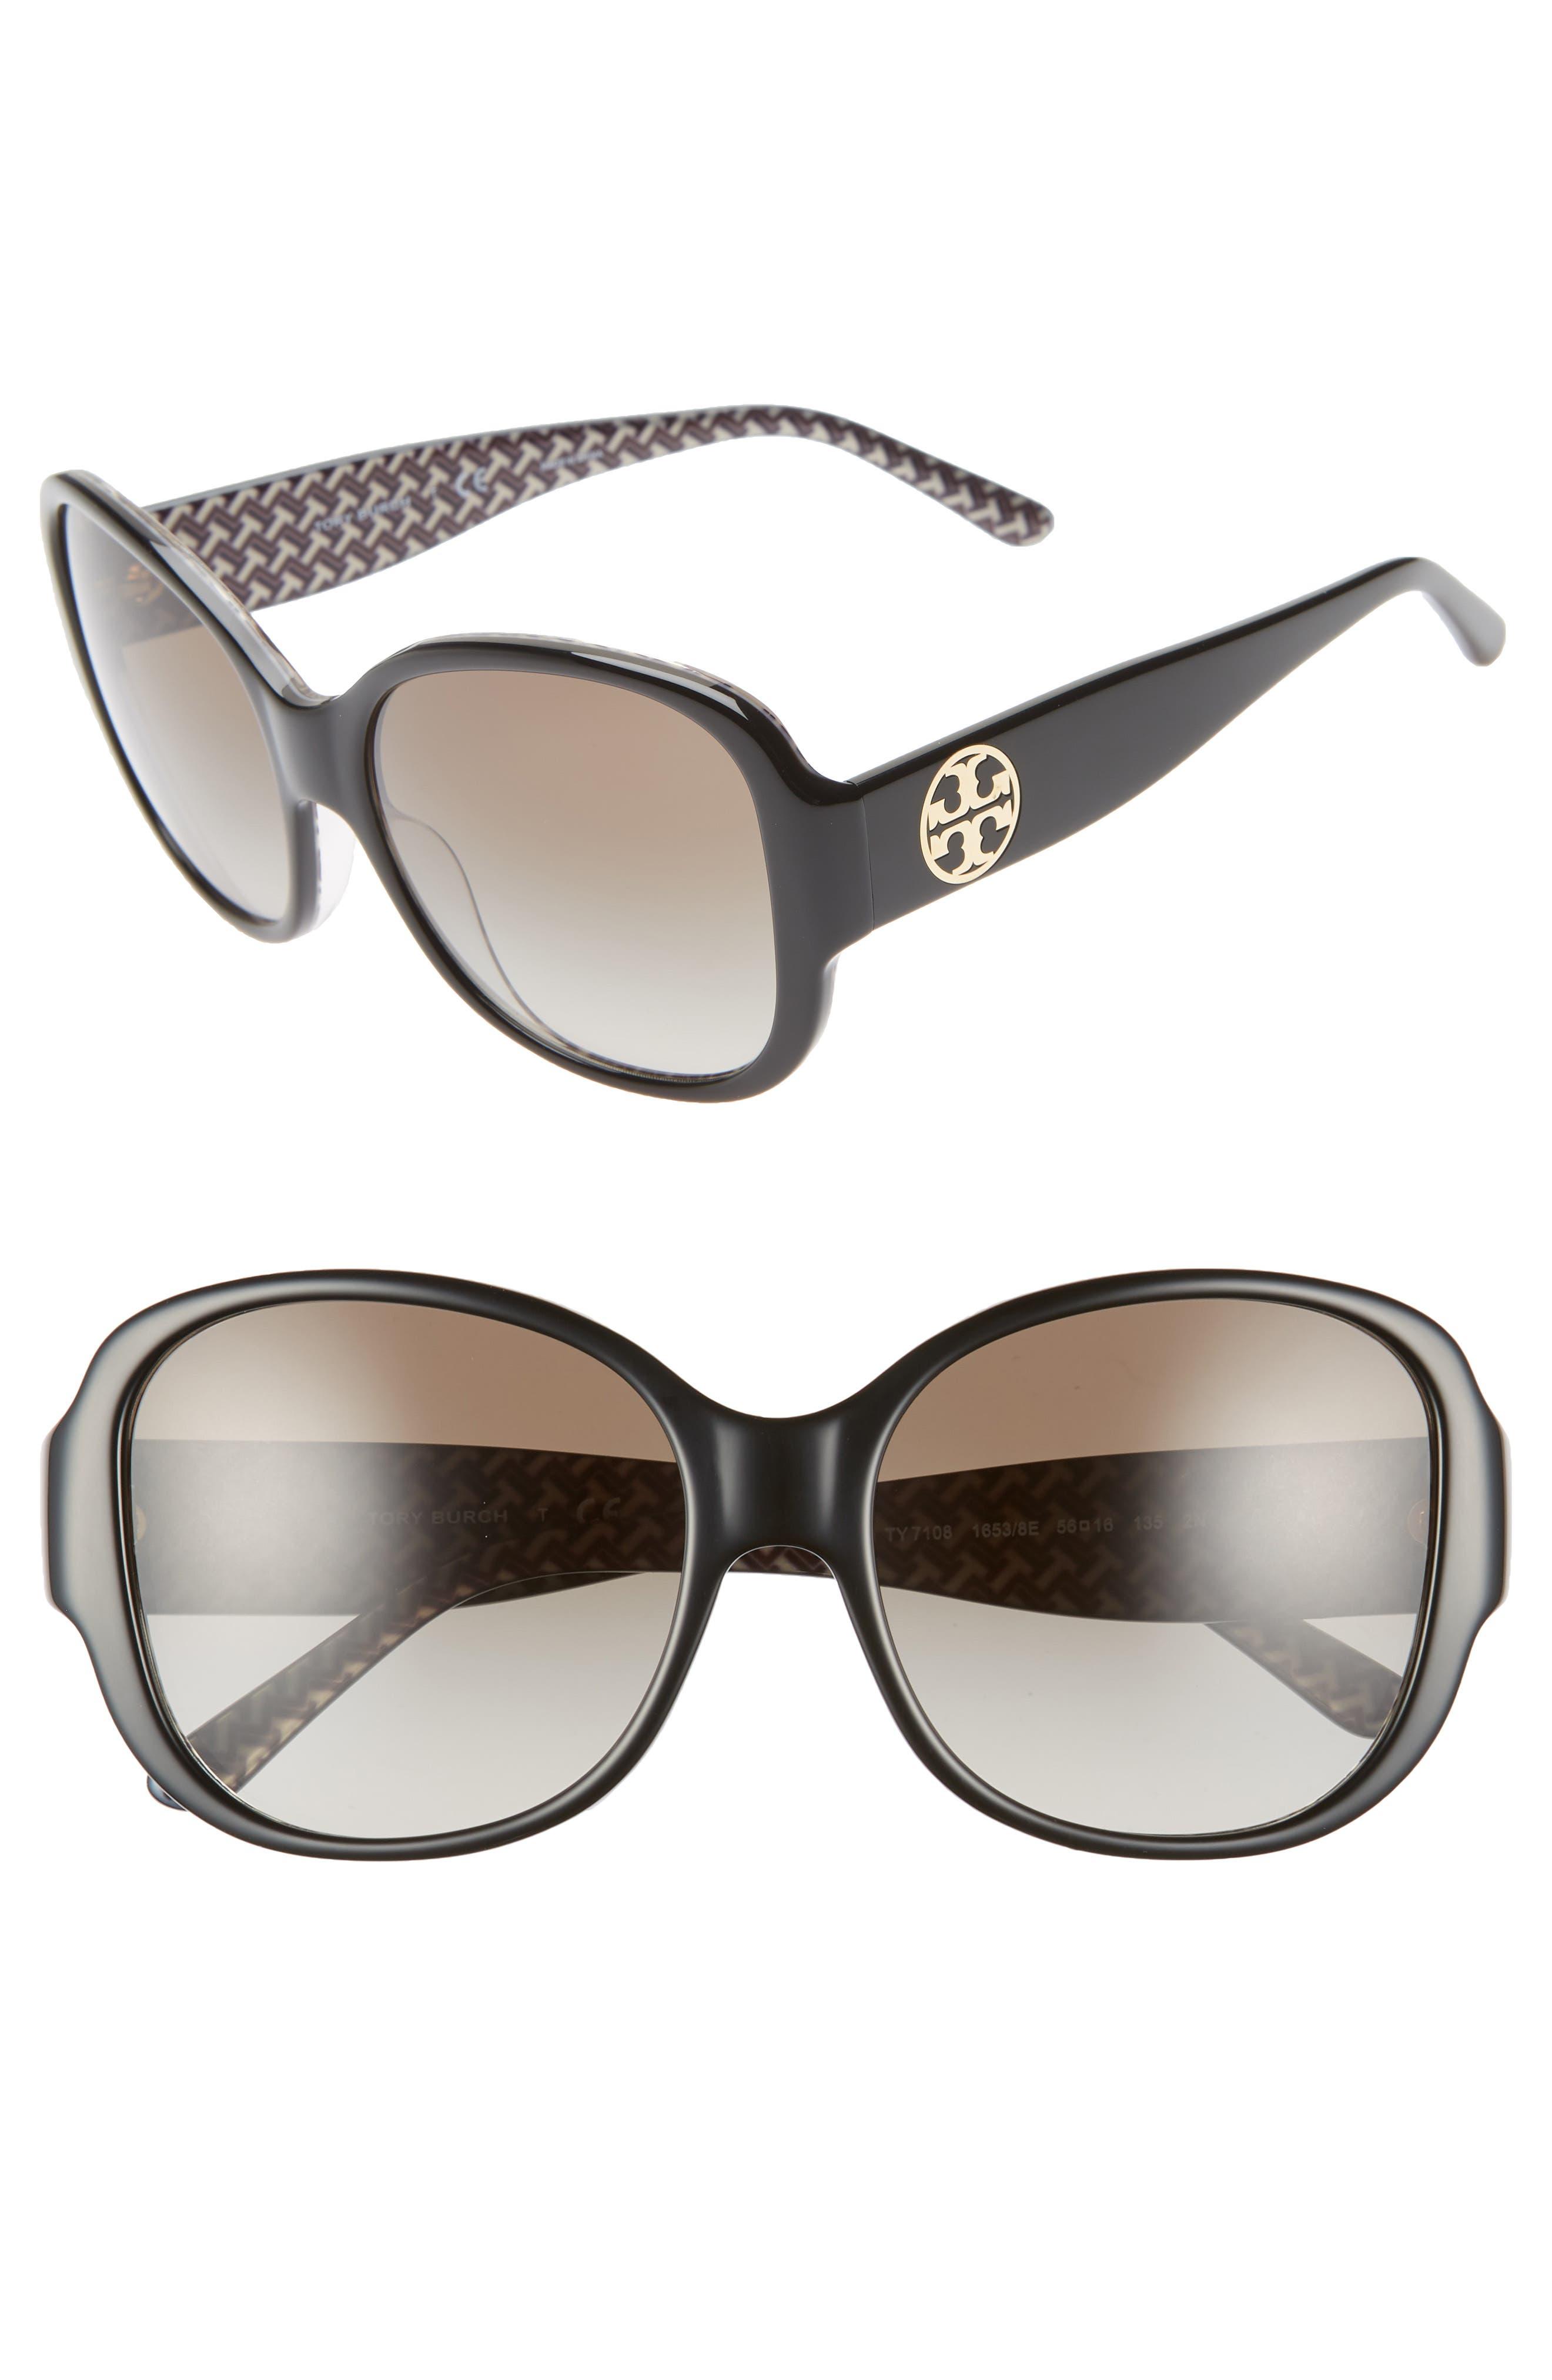 56mm Gradient Retro Sunglasses,                             Main thumbnail 1, color,                             009